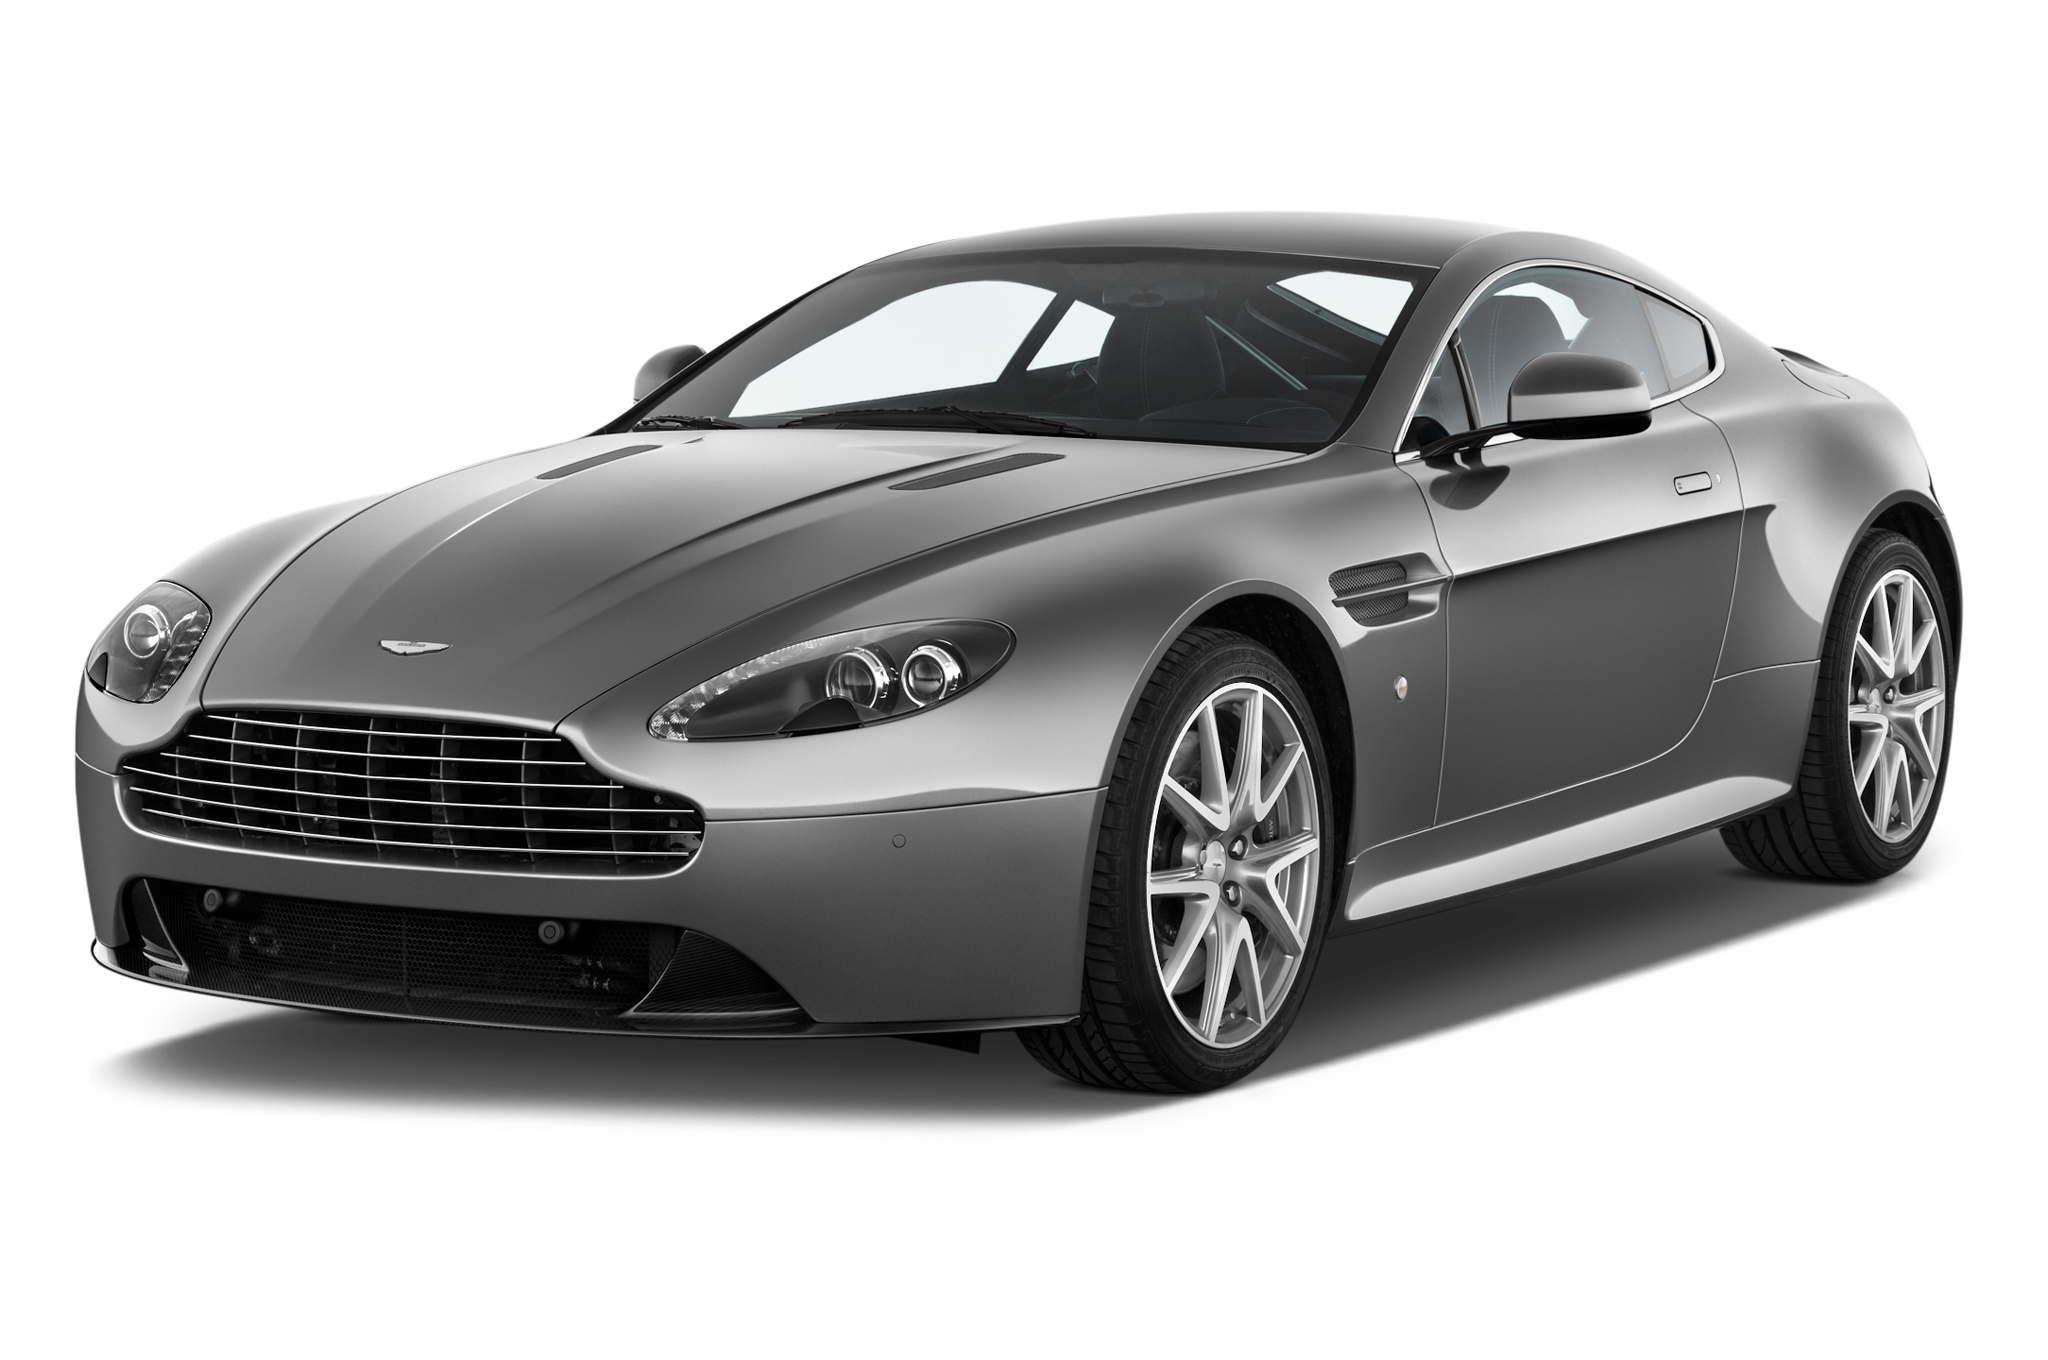 56 80   Aston Martin Png - Aston Martin Auto Vector, Transparent background PNG HD thumbnail